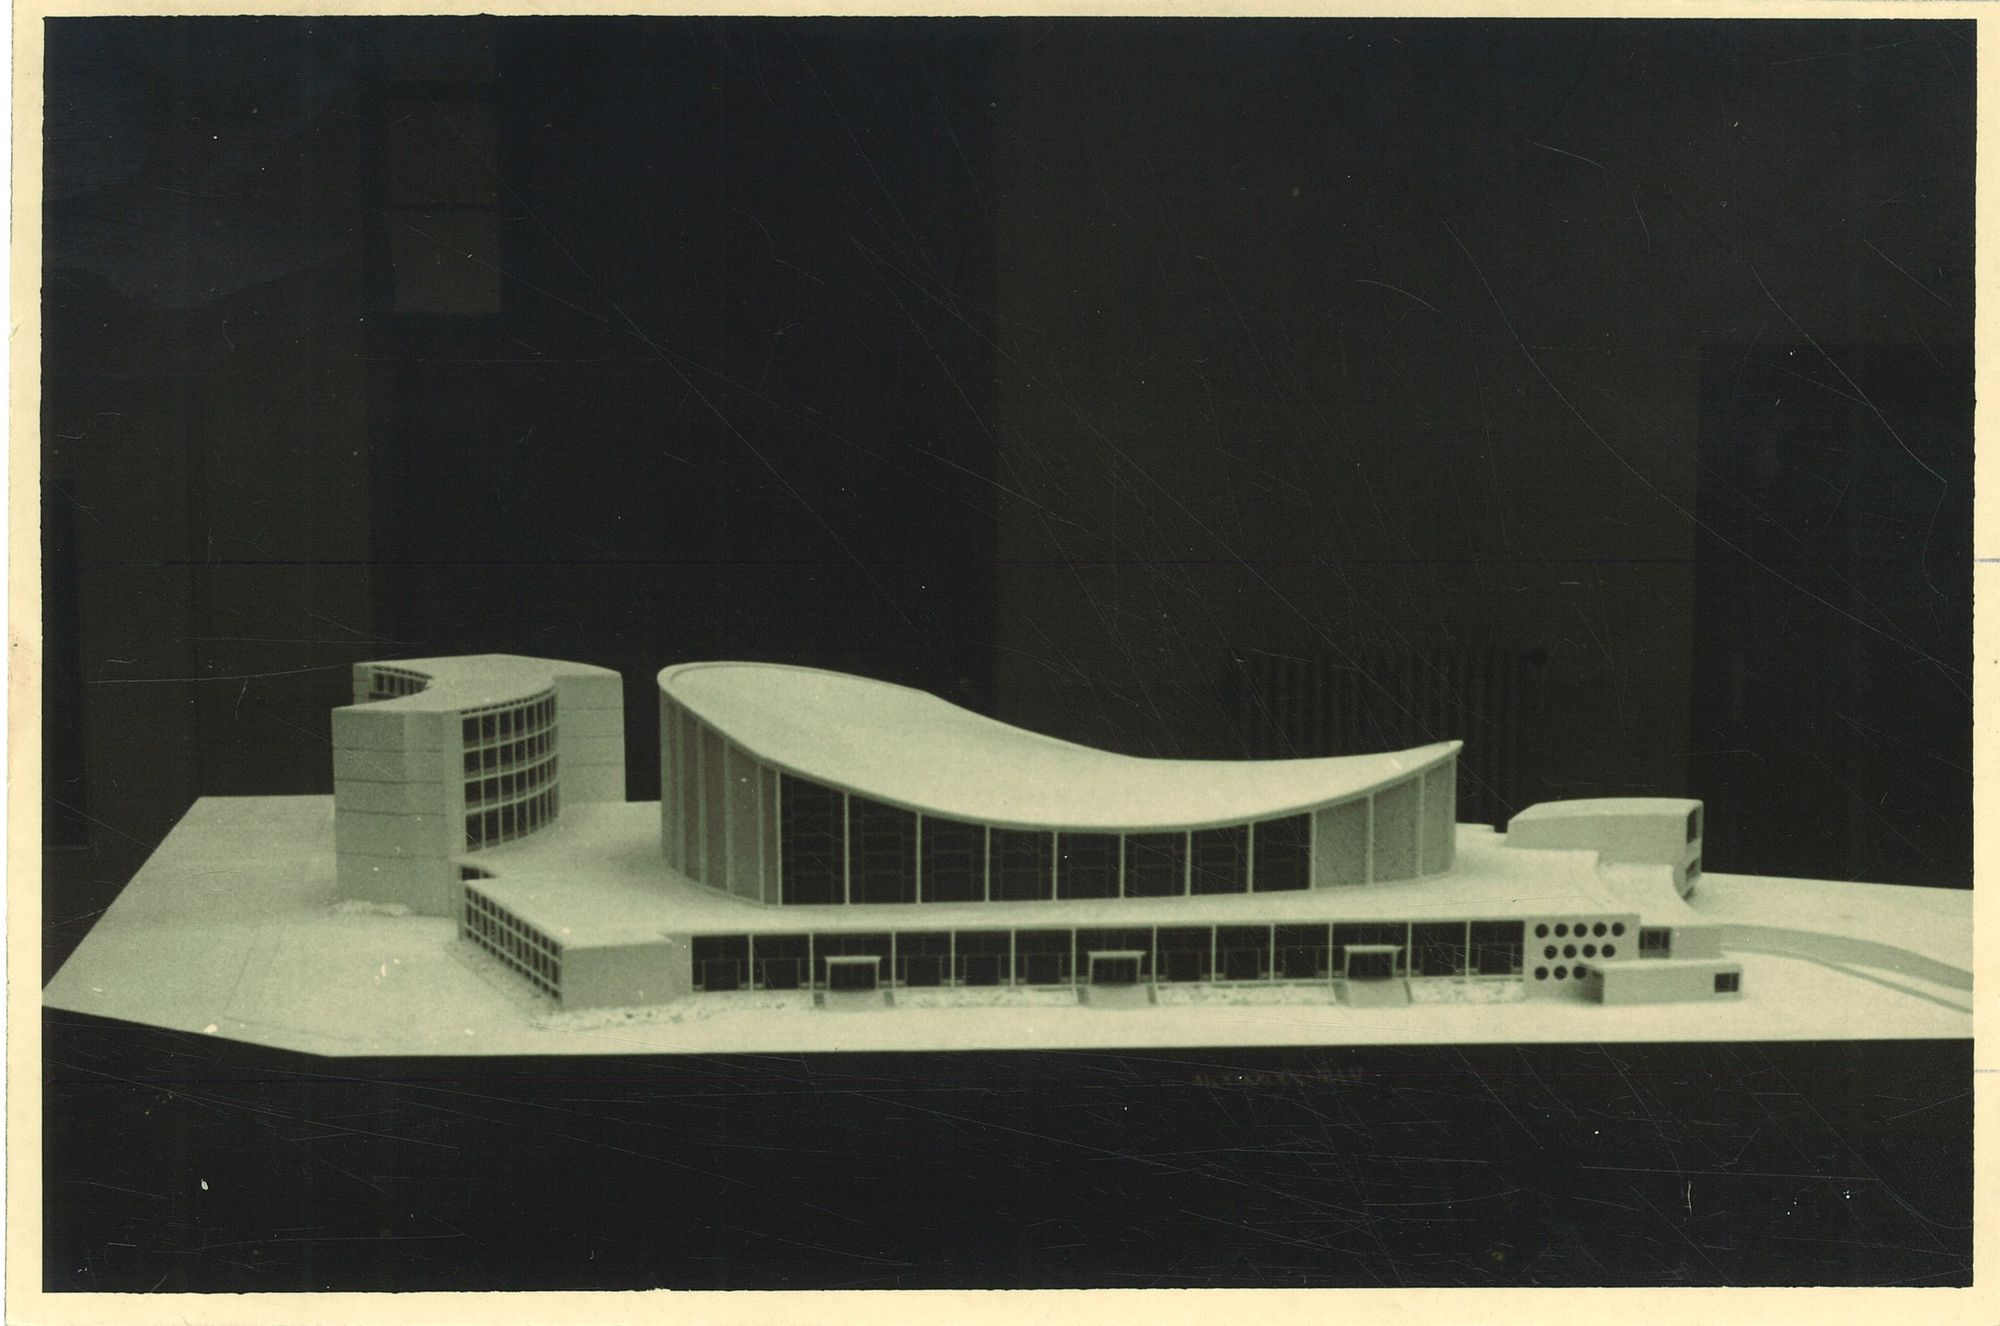 Maquette van de Leielandhalle